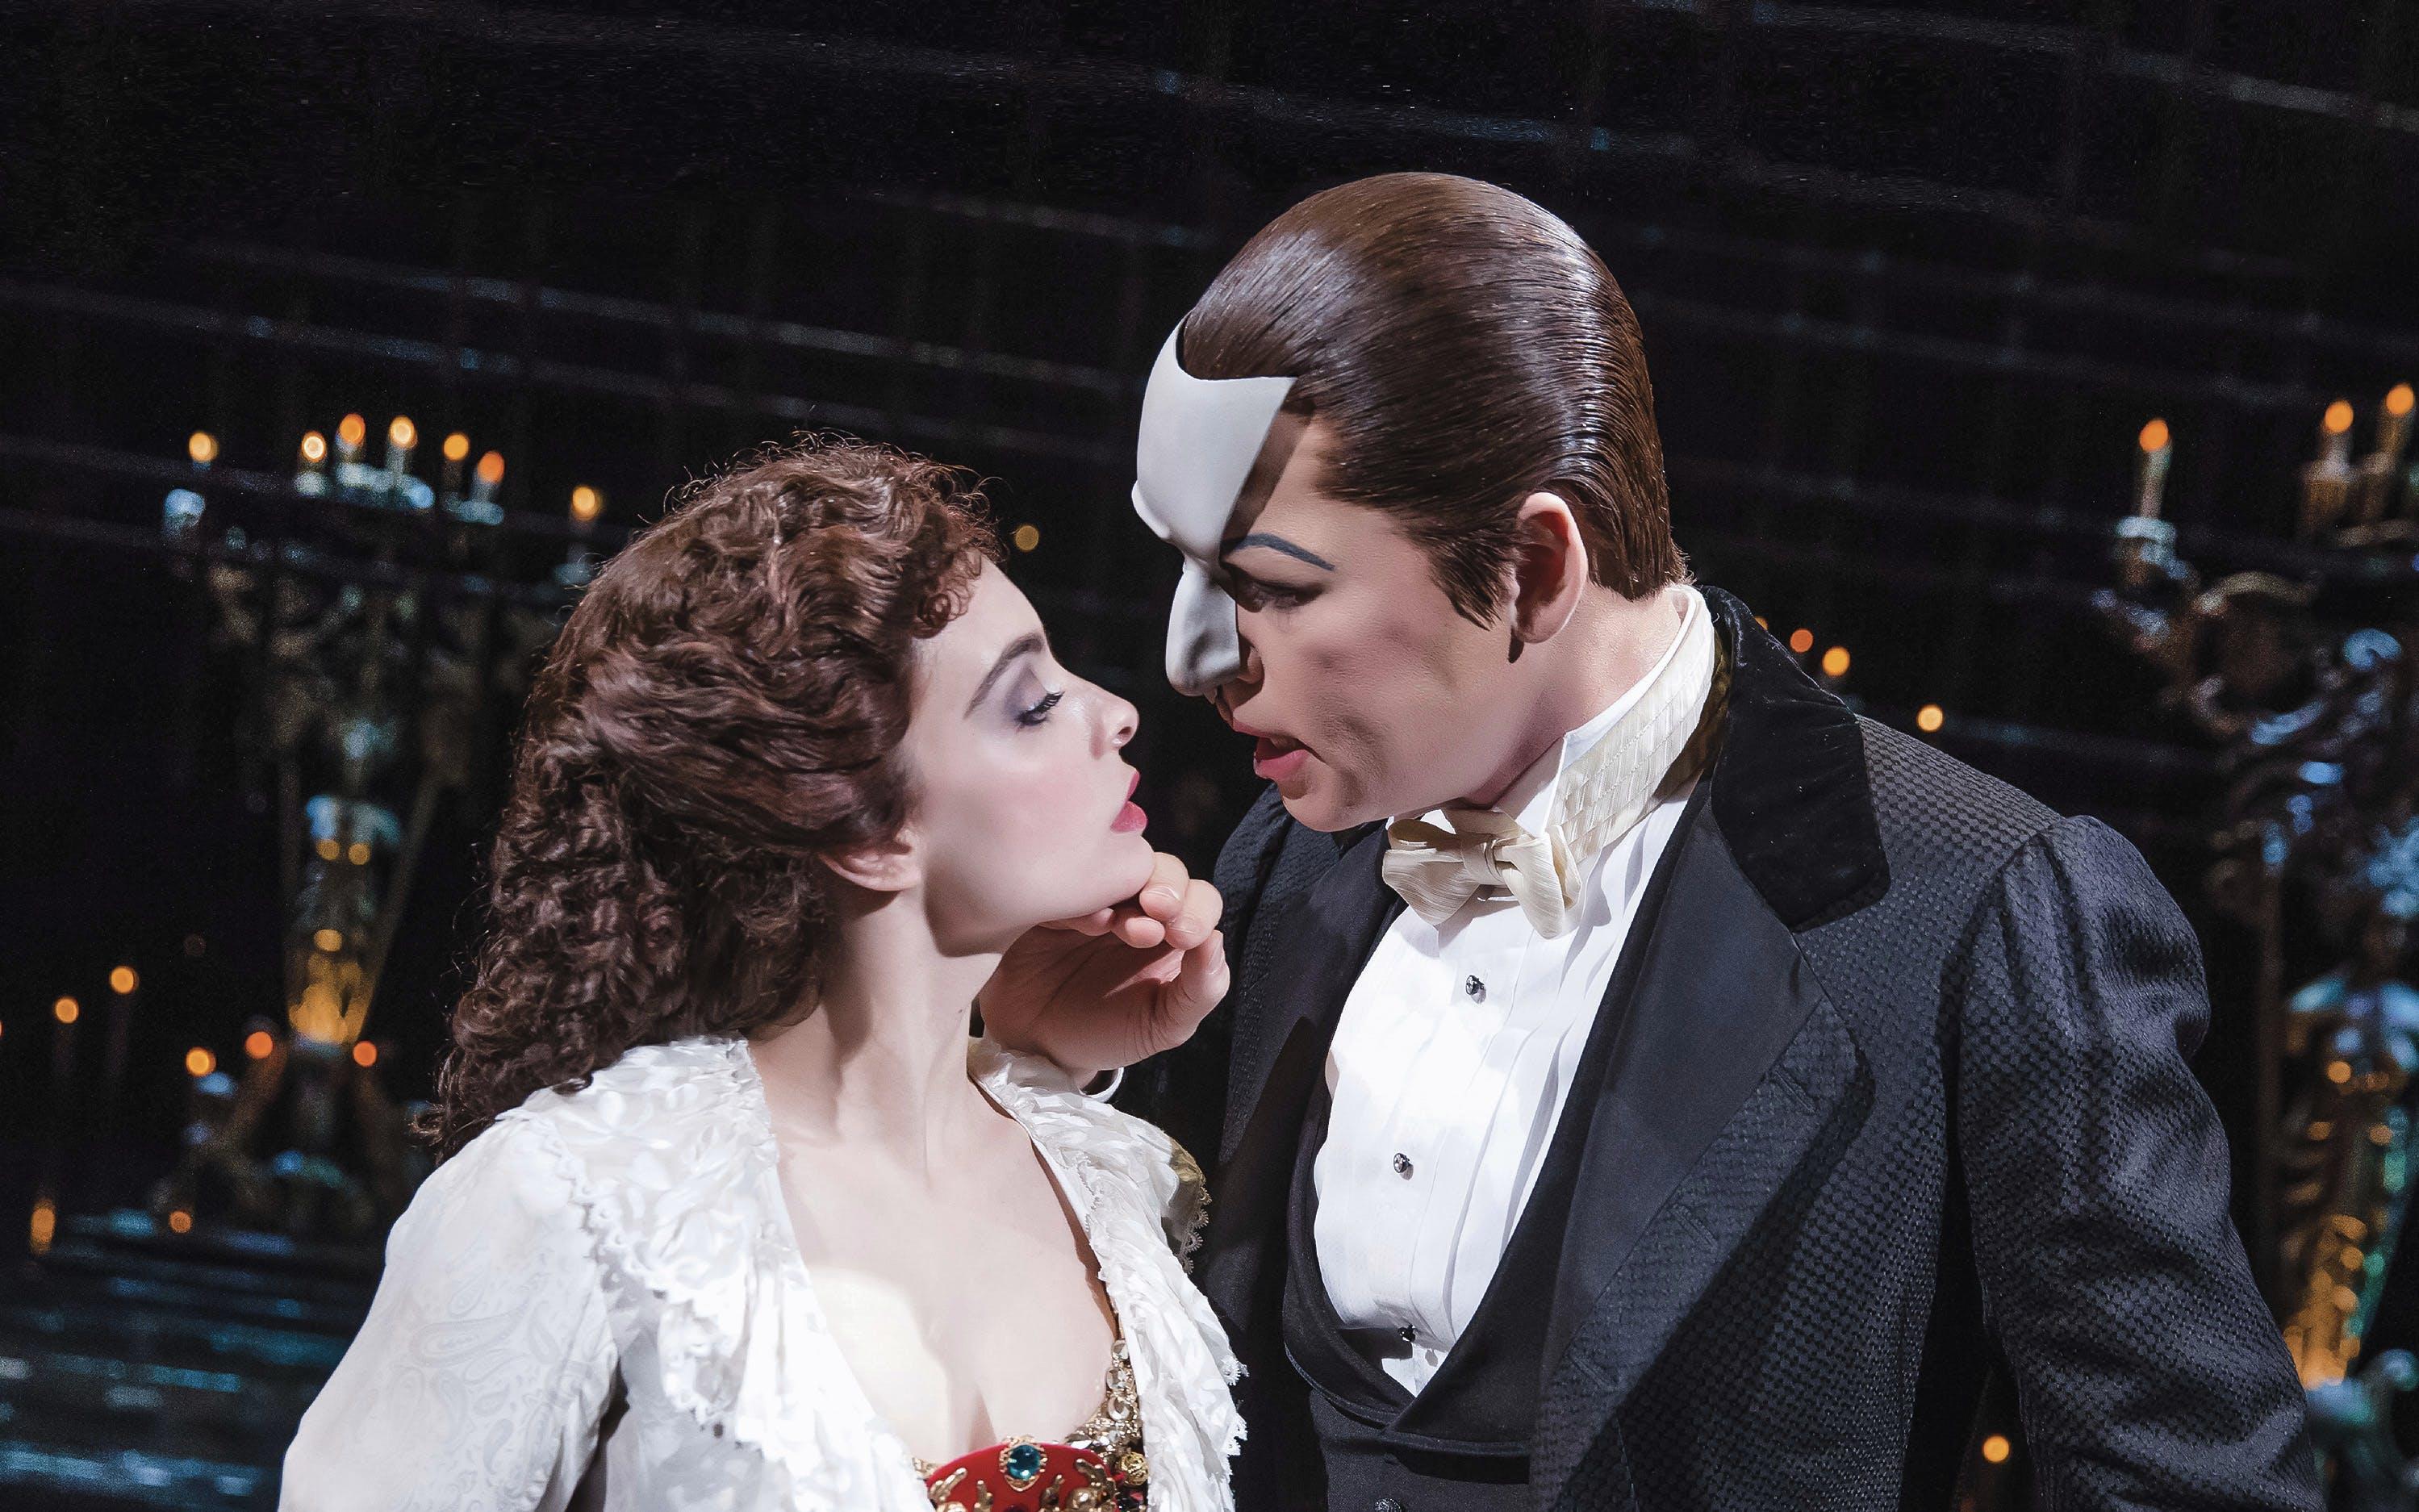 cheap-broadway-tickets-the-phantom-of-the-opera-3